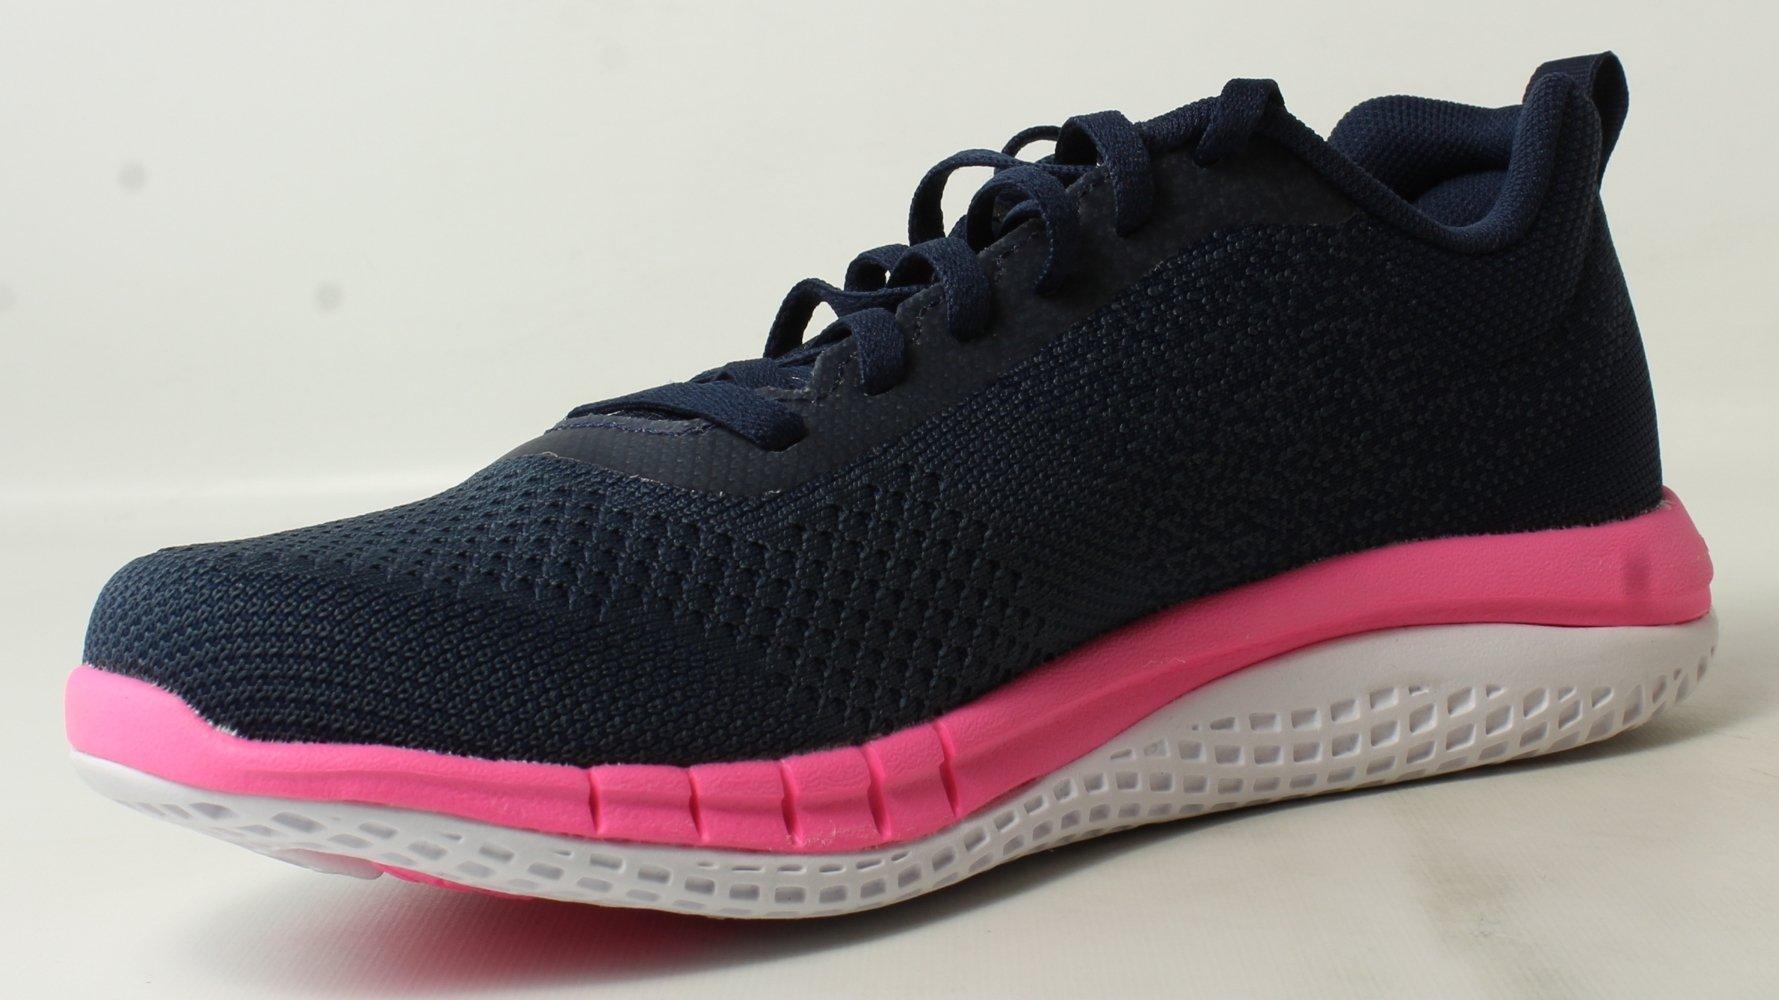 Reebok Women's Rbk Print Run Prime Ultk Sneaker, Avon-Coll Navy/Small Indigo, 9 M US